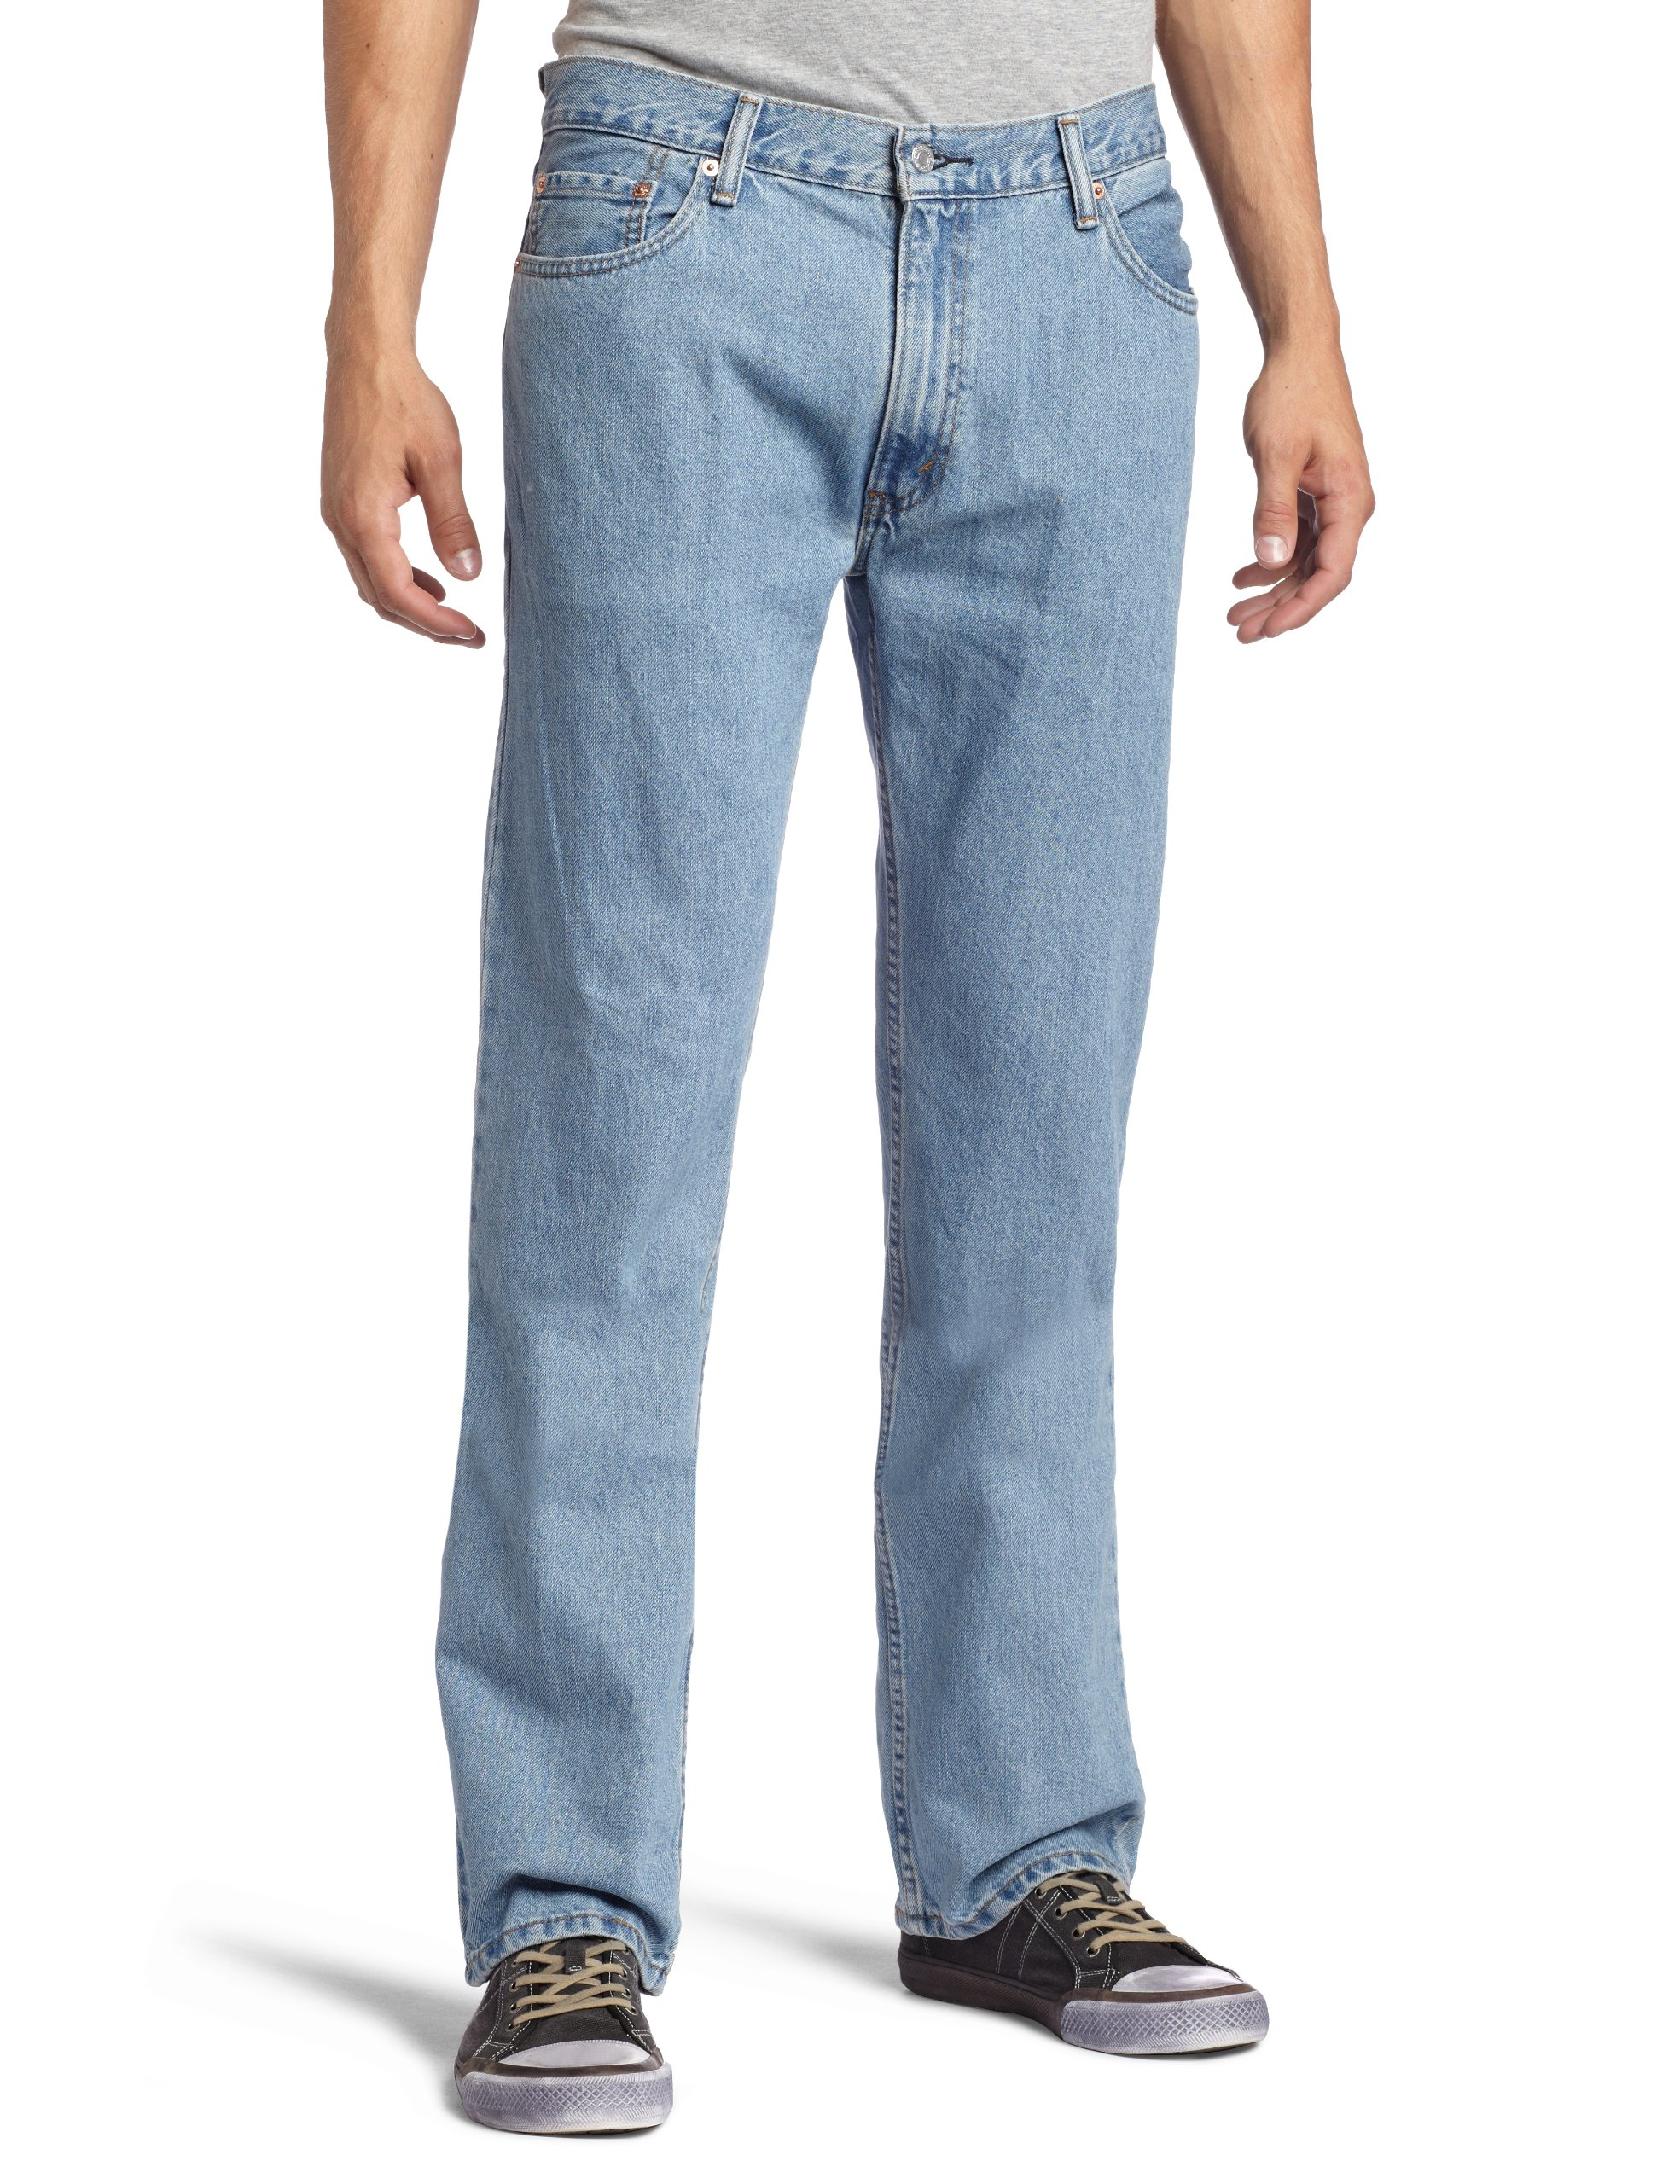 Levi's Men's 505 Regular Fit Jean, Light Stonewash, 33x29